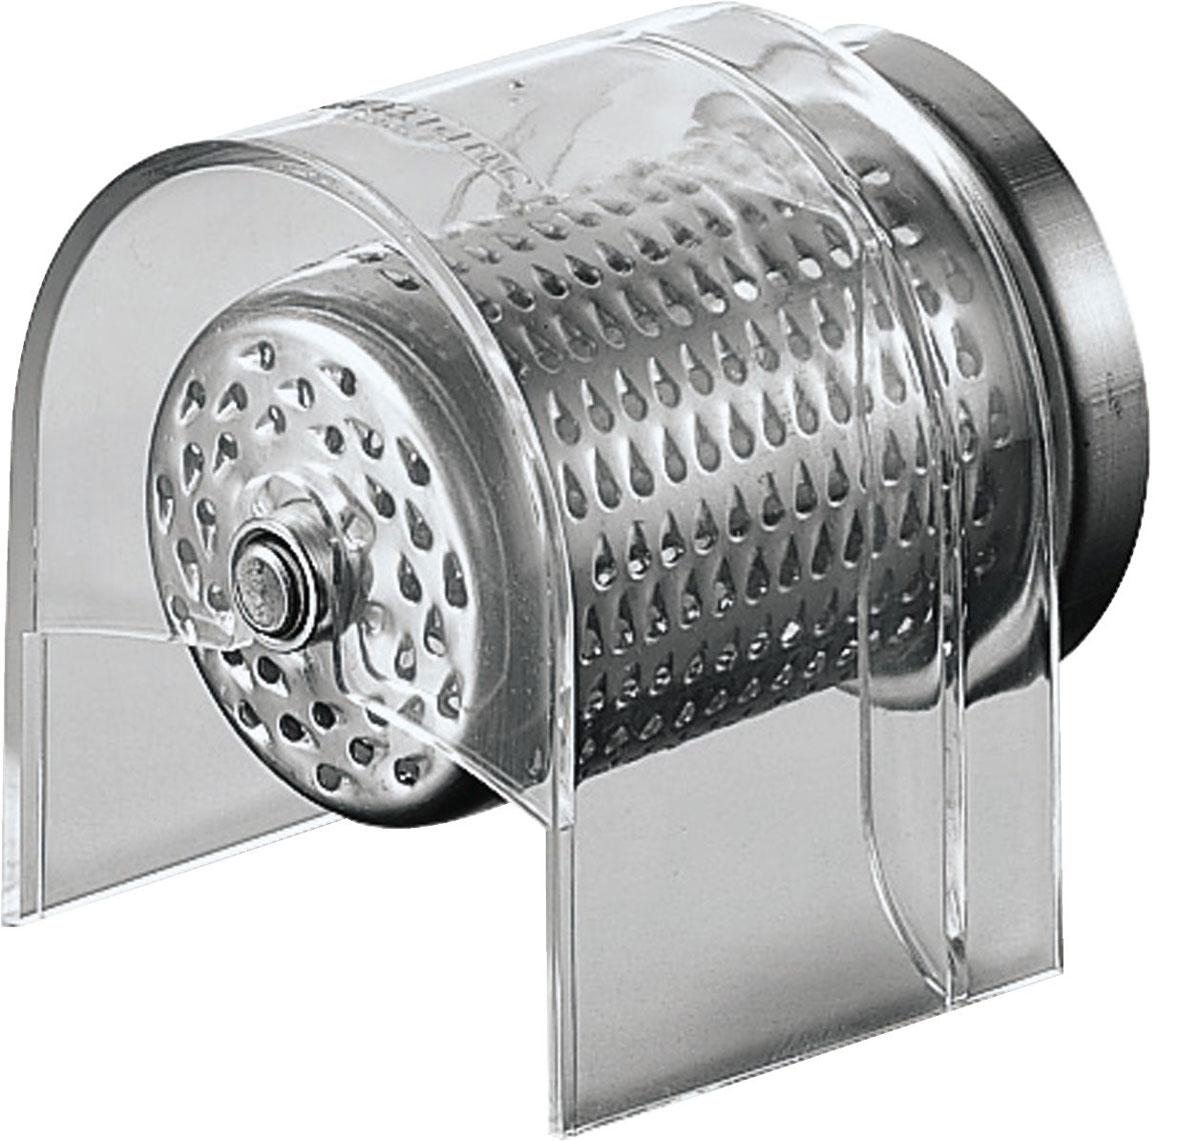 Bosch MUZ45RV1 диск-терка для кухонных комбайнов